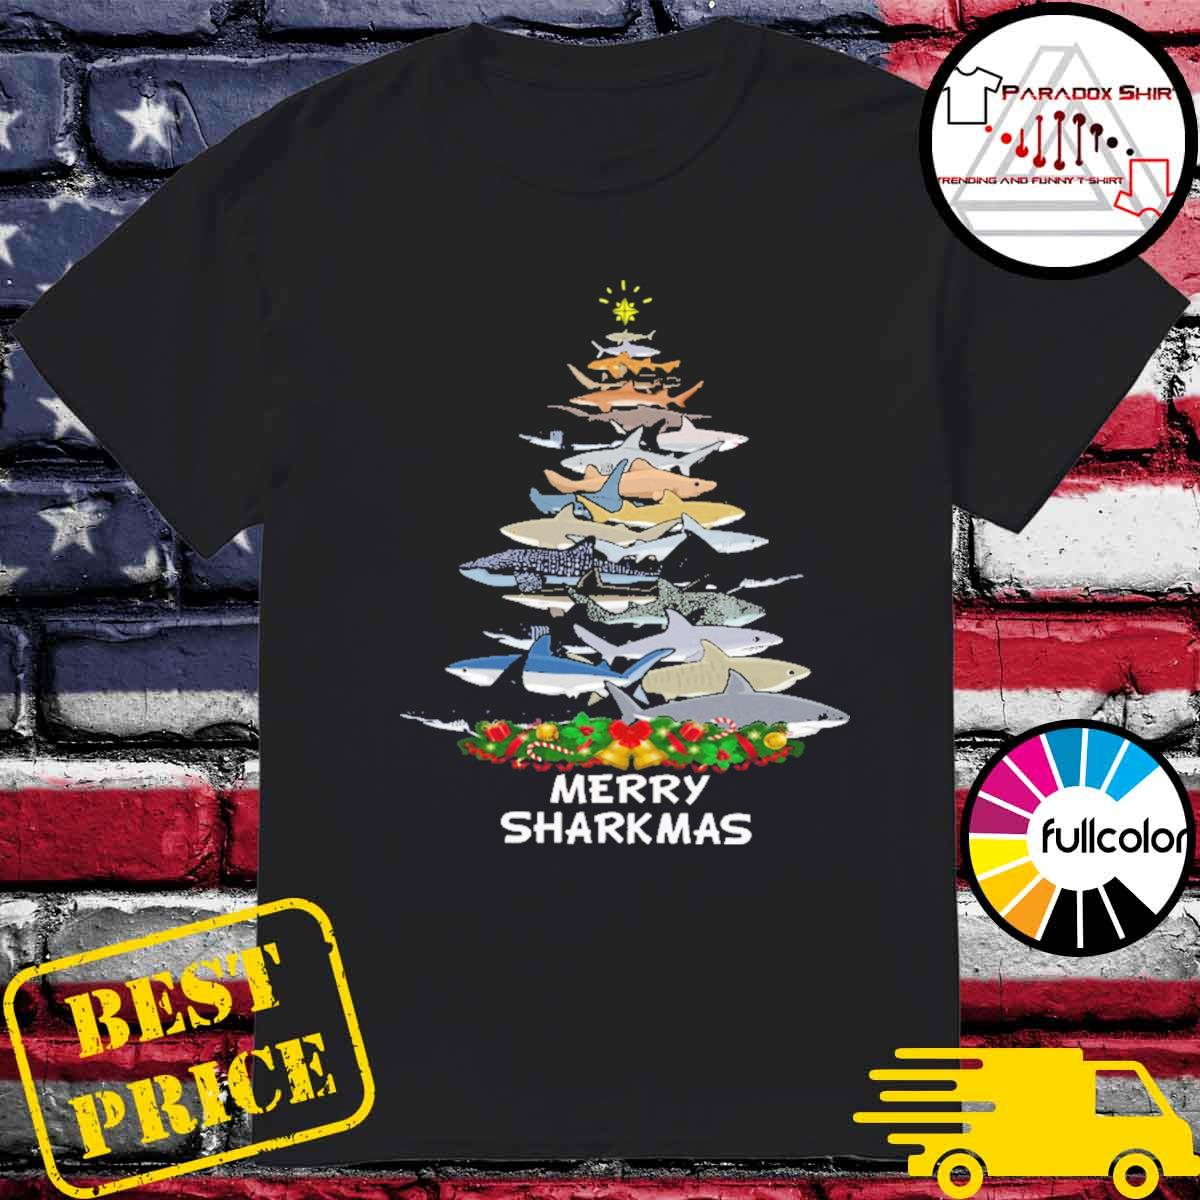 Sharks tree Merry Sharkmas shirt